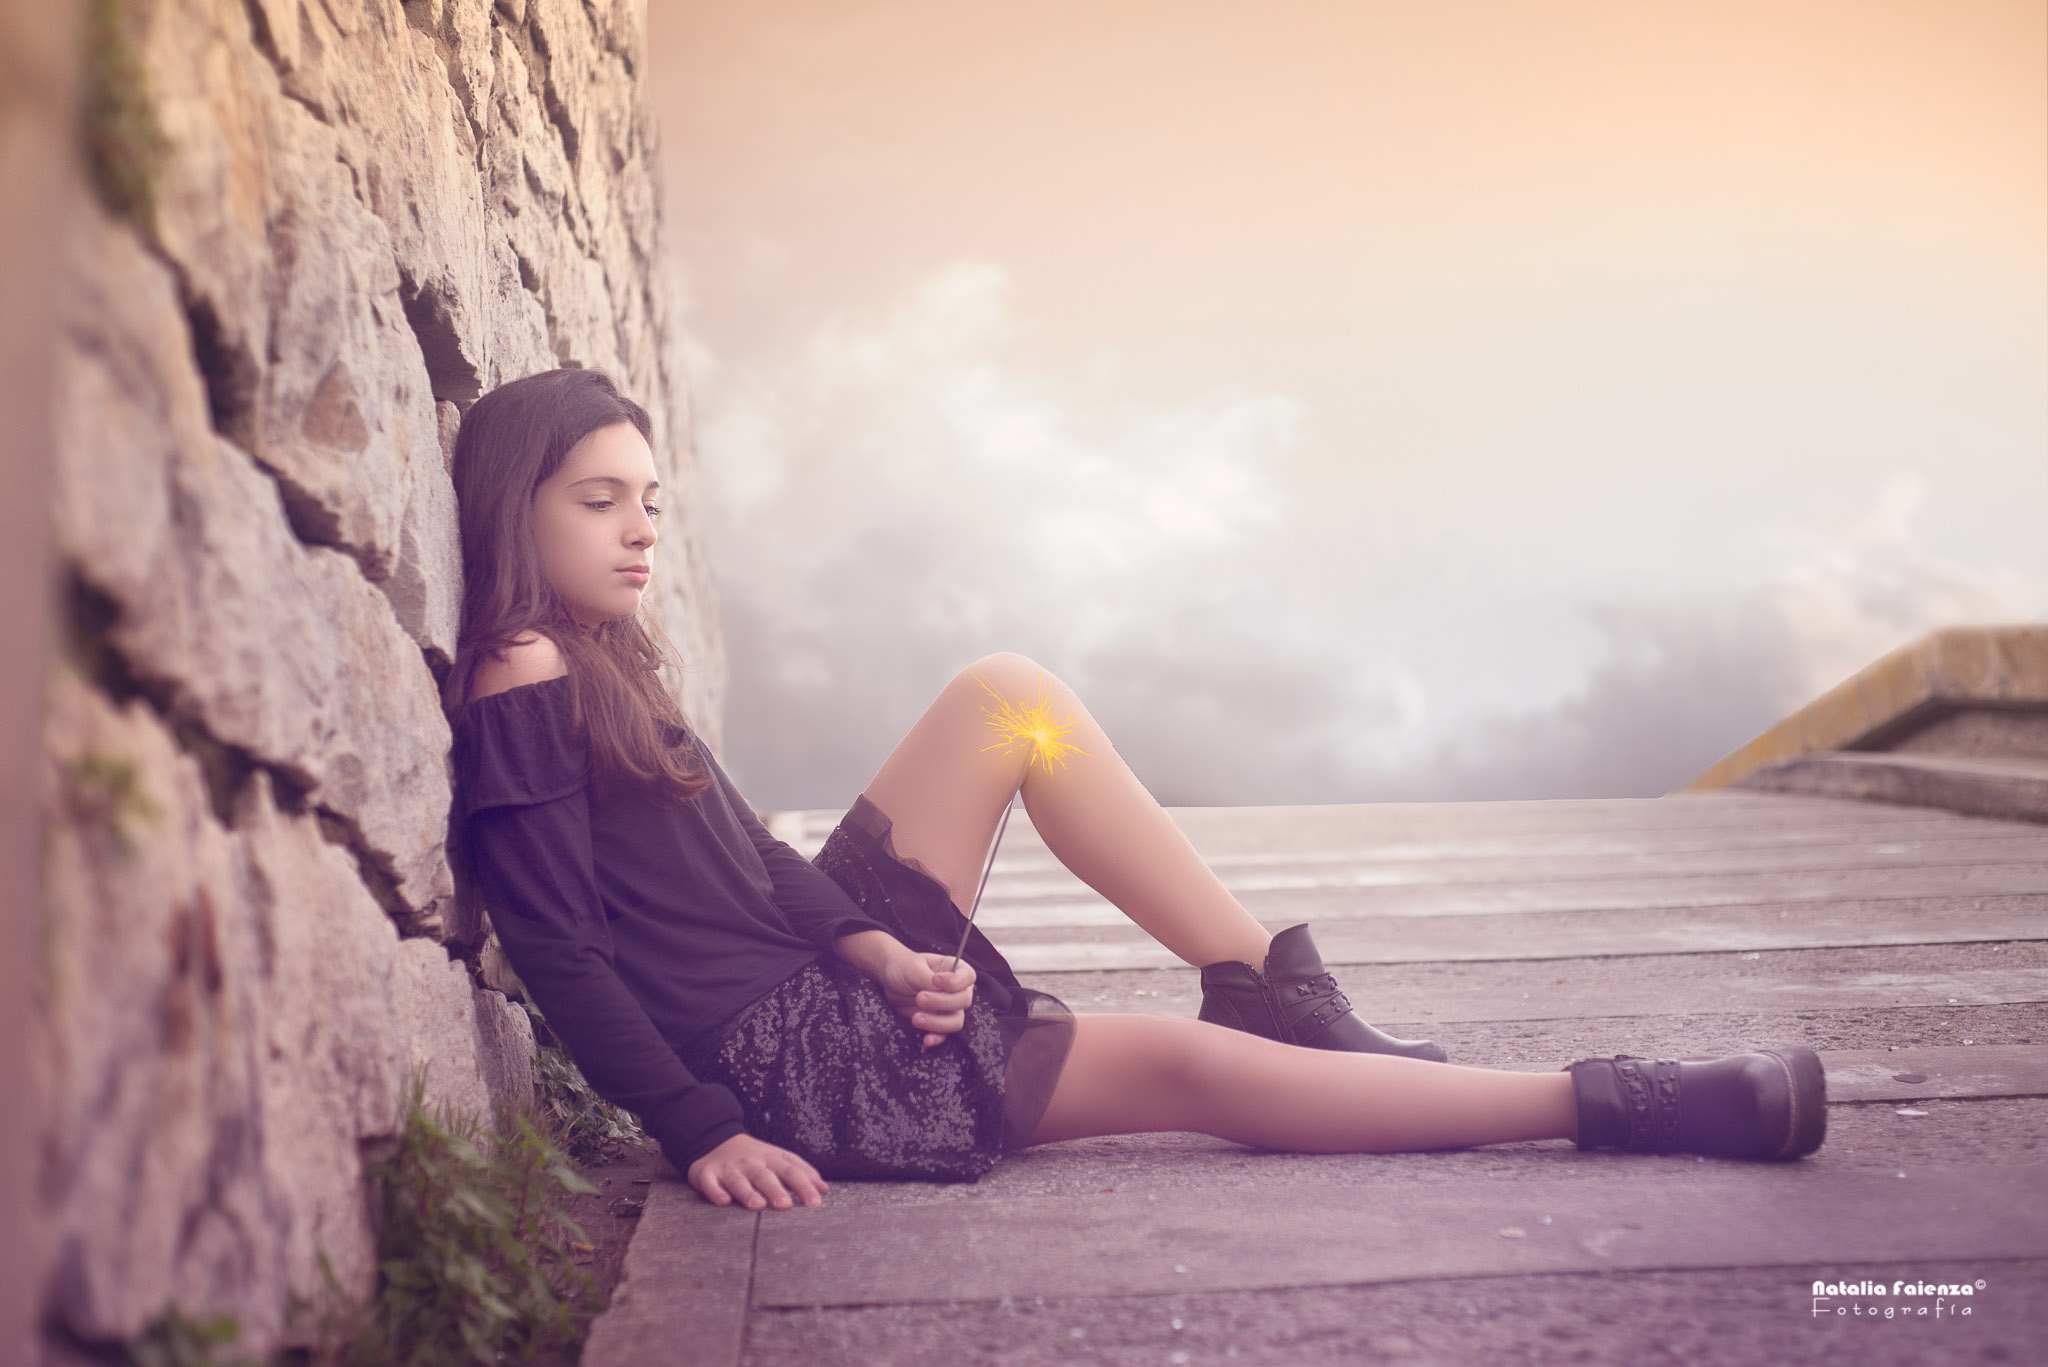 Natalia_Faienza_FotografíaDSC_6865-Editar